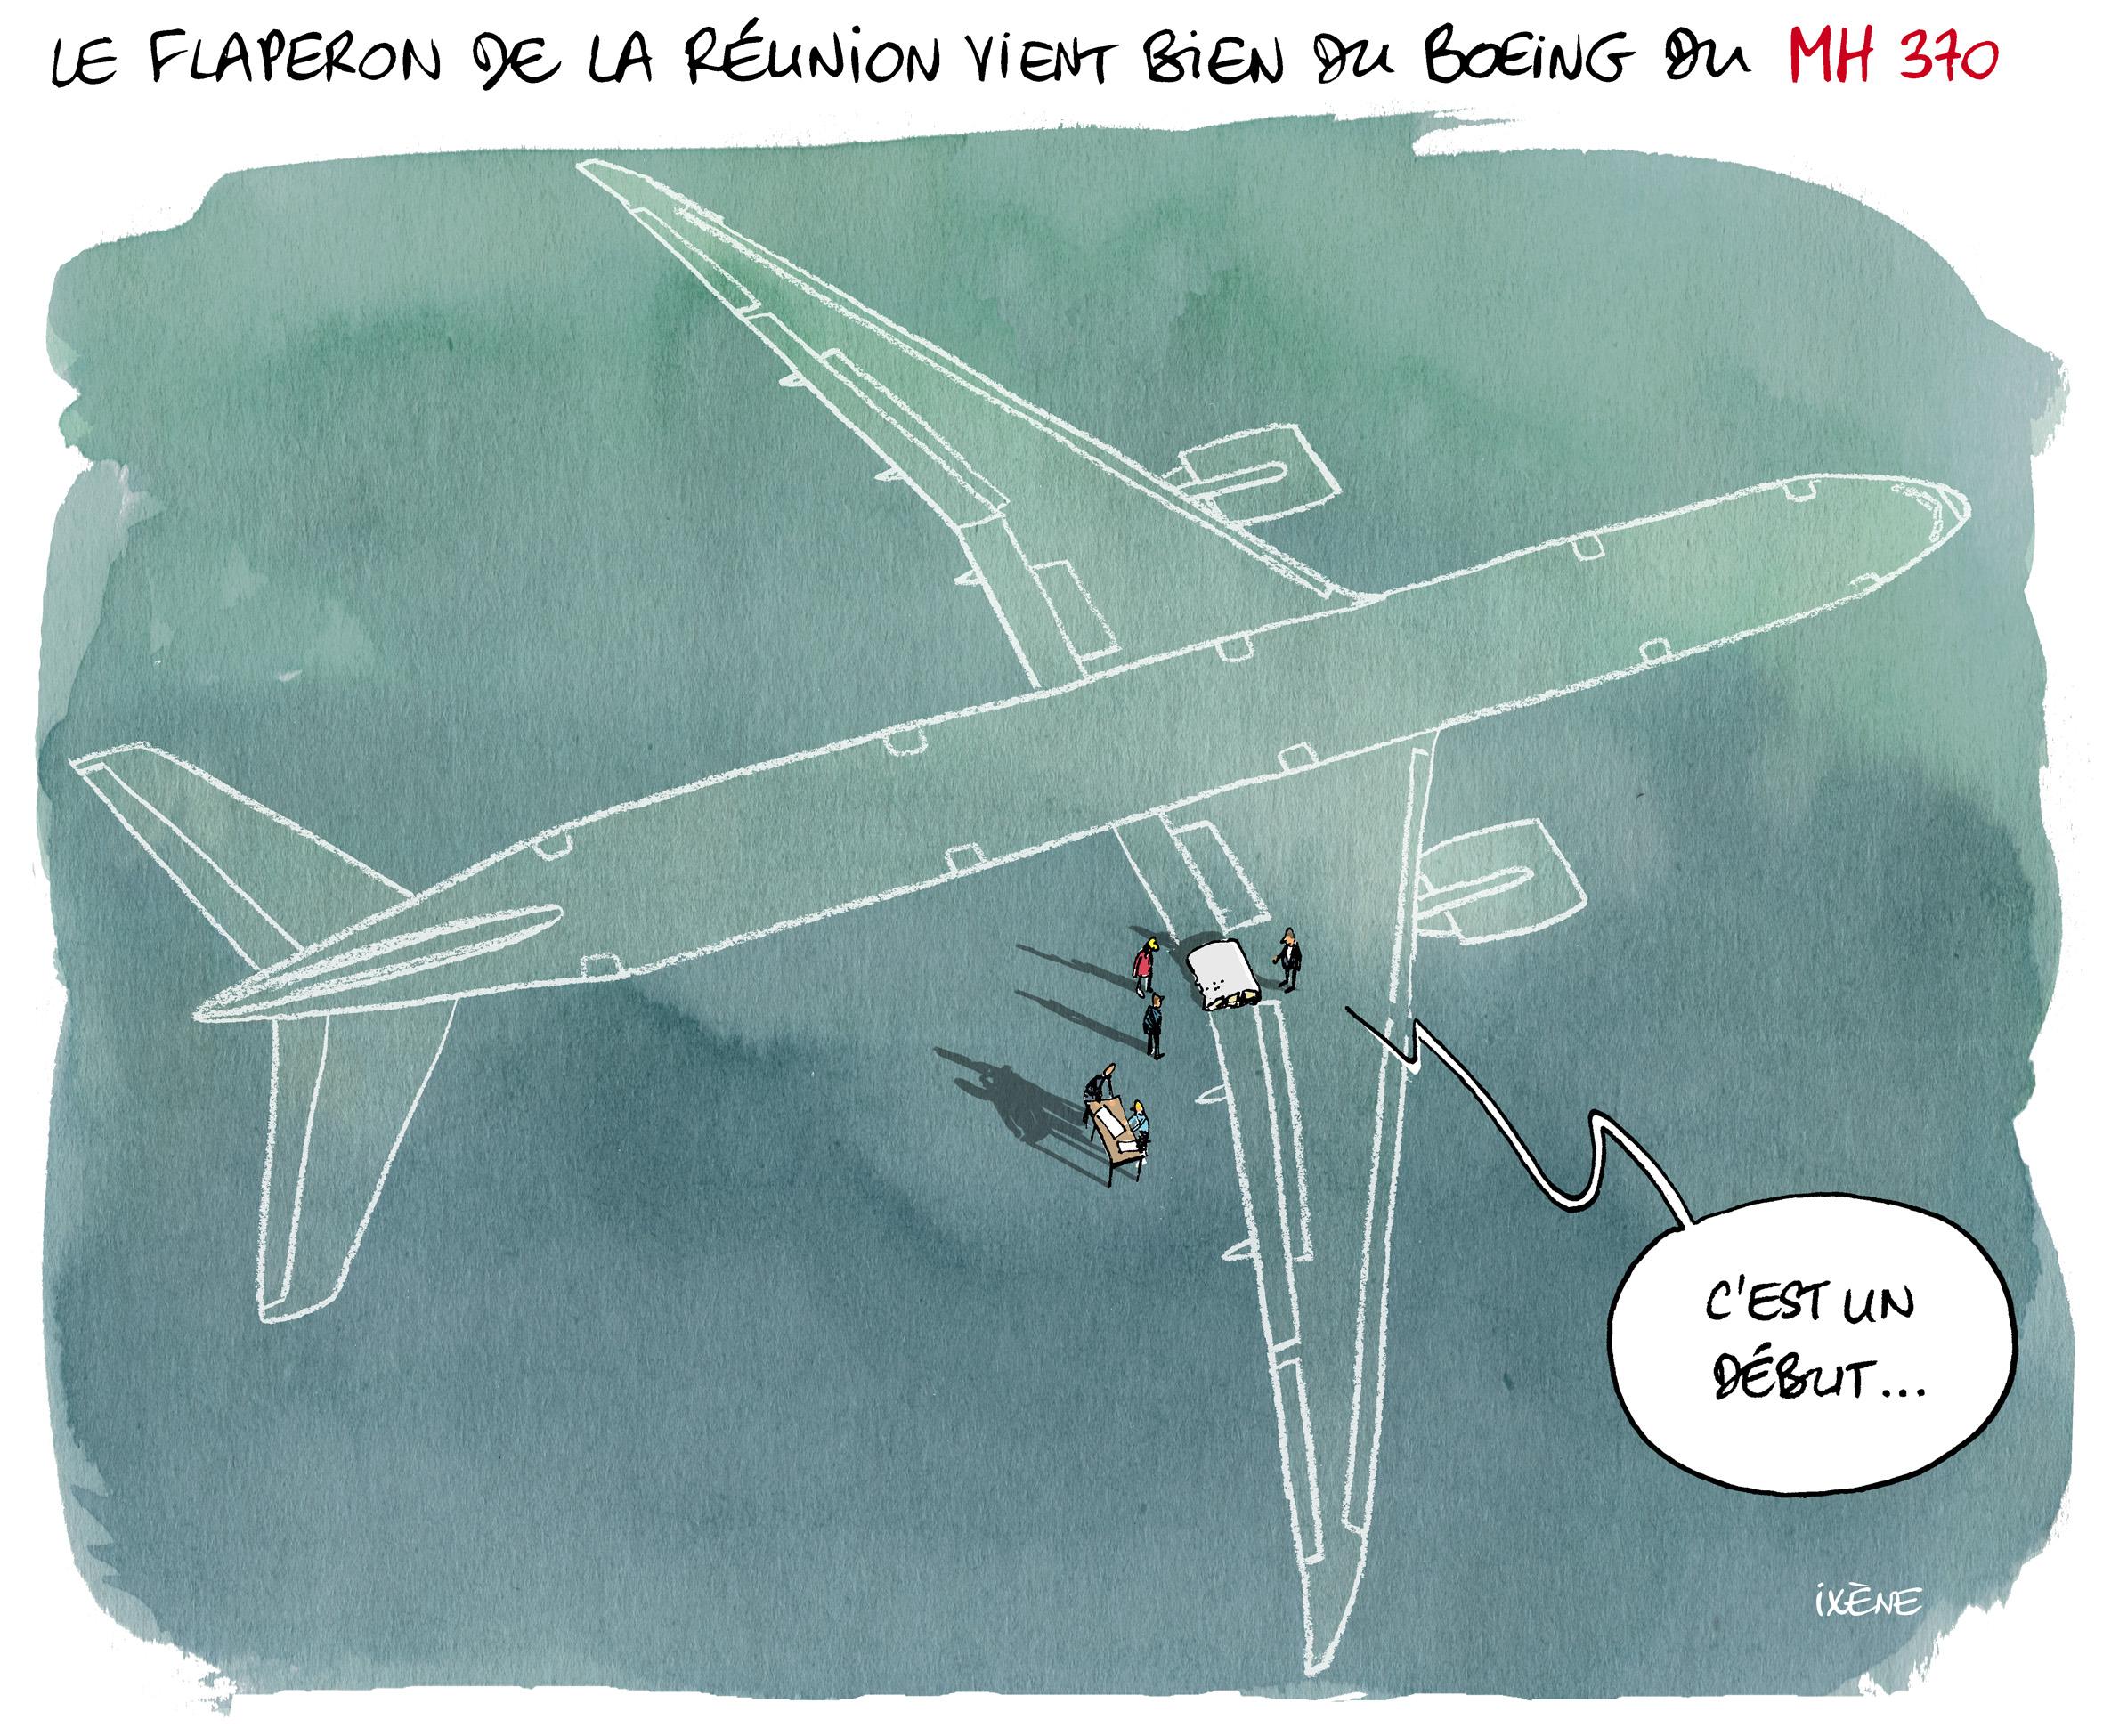 2015 08 05 Flaperon MH370 01